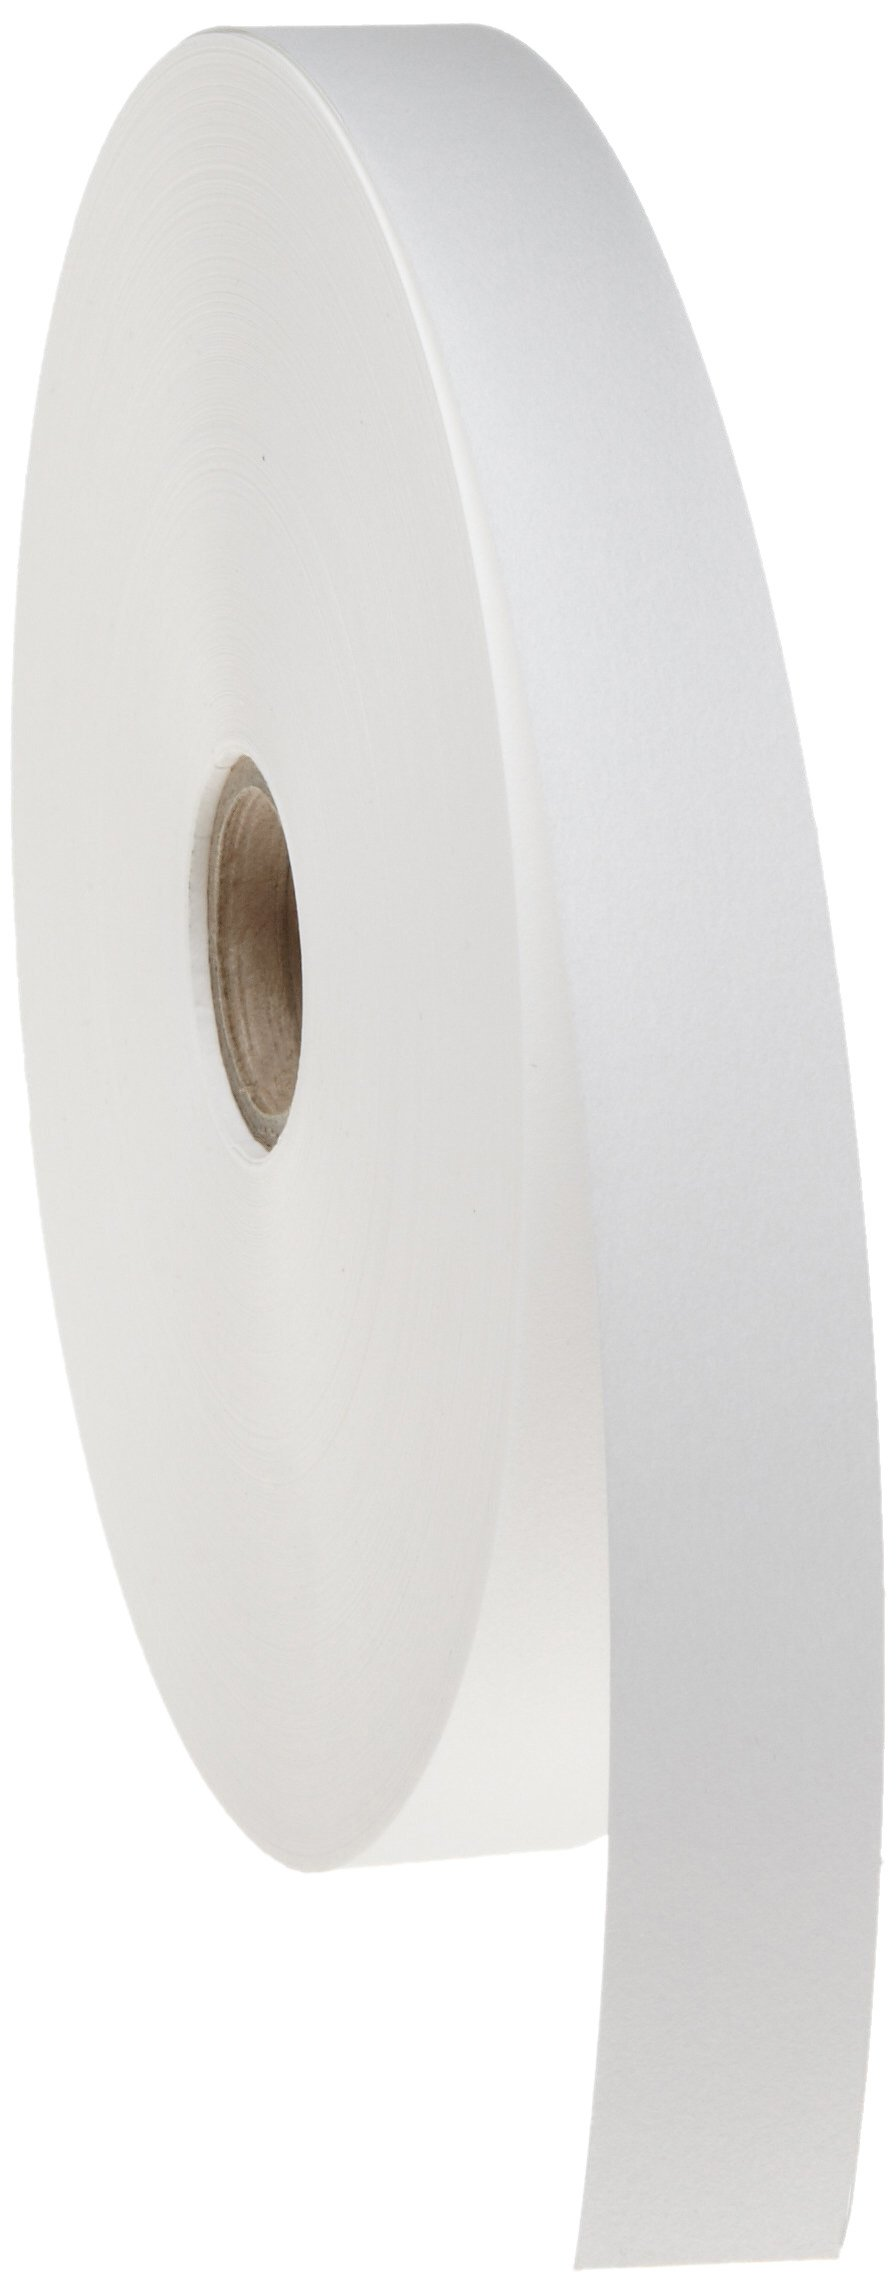 GE Whatman 3030-614 Grade 3MM Chr Cellulose Chromatography Paper Roll, 2cm Width, 100m Length